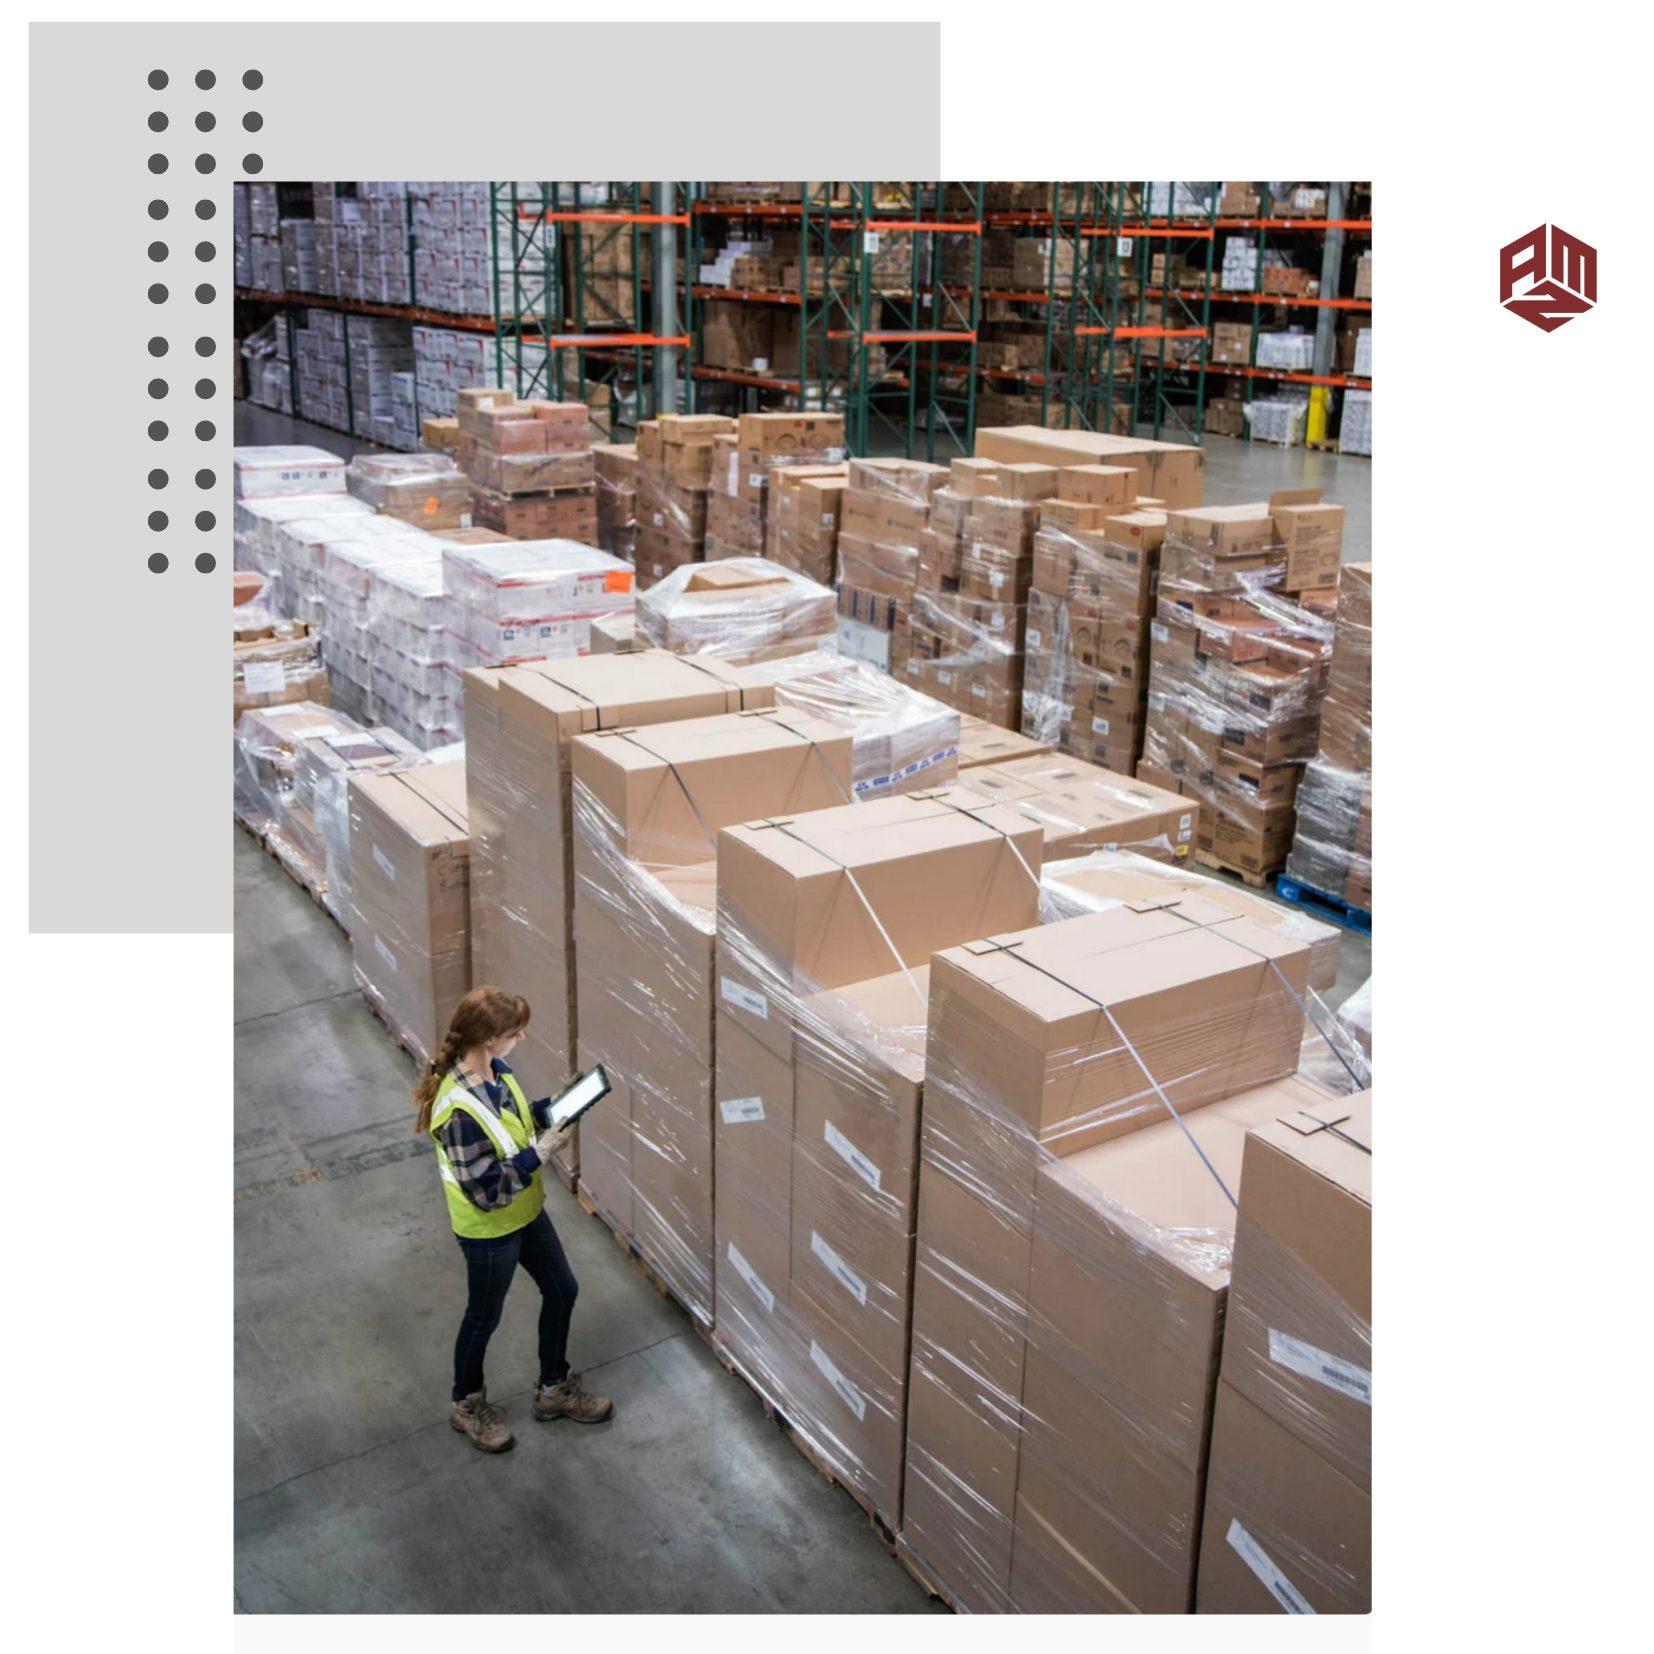 Amazon FBA Warehouse Canada 3PL Fulfillment